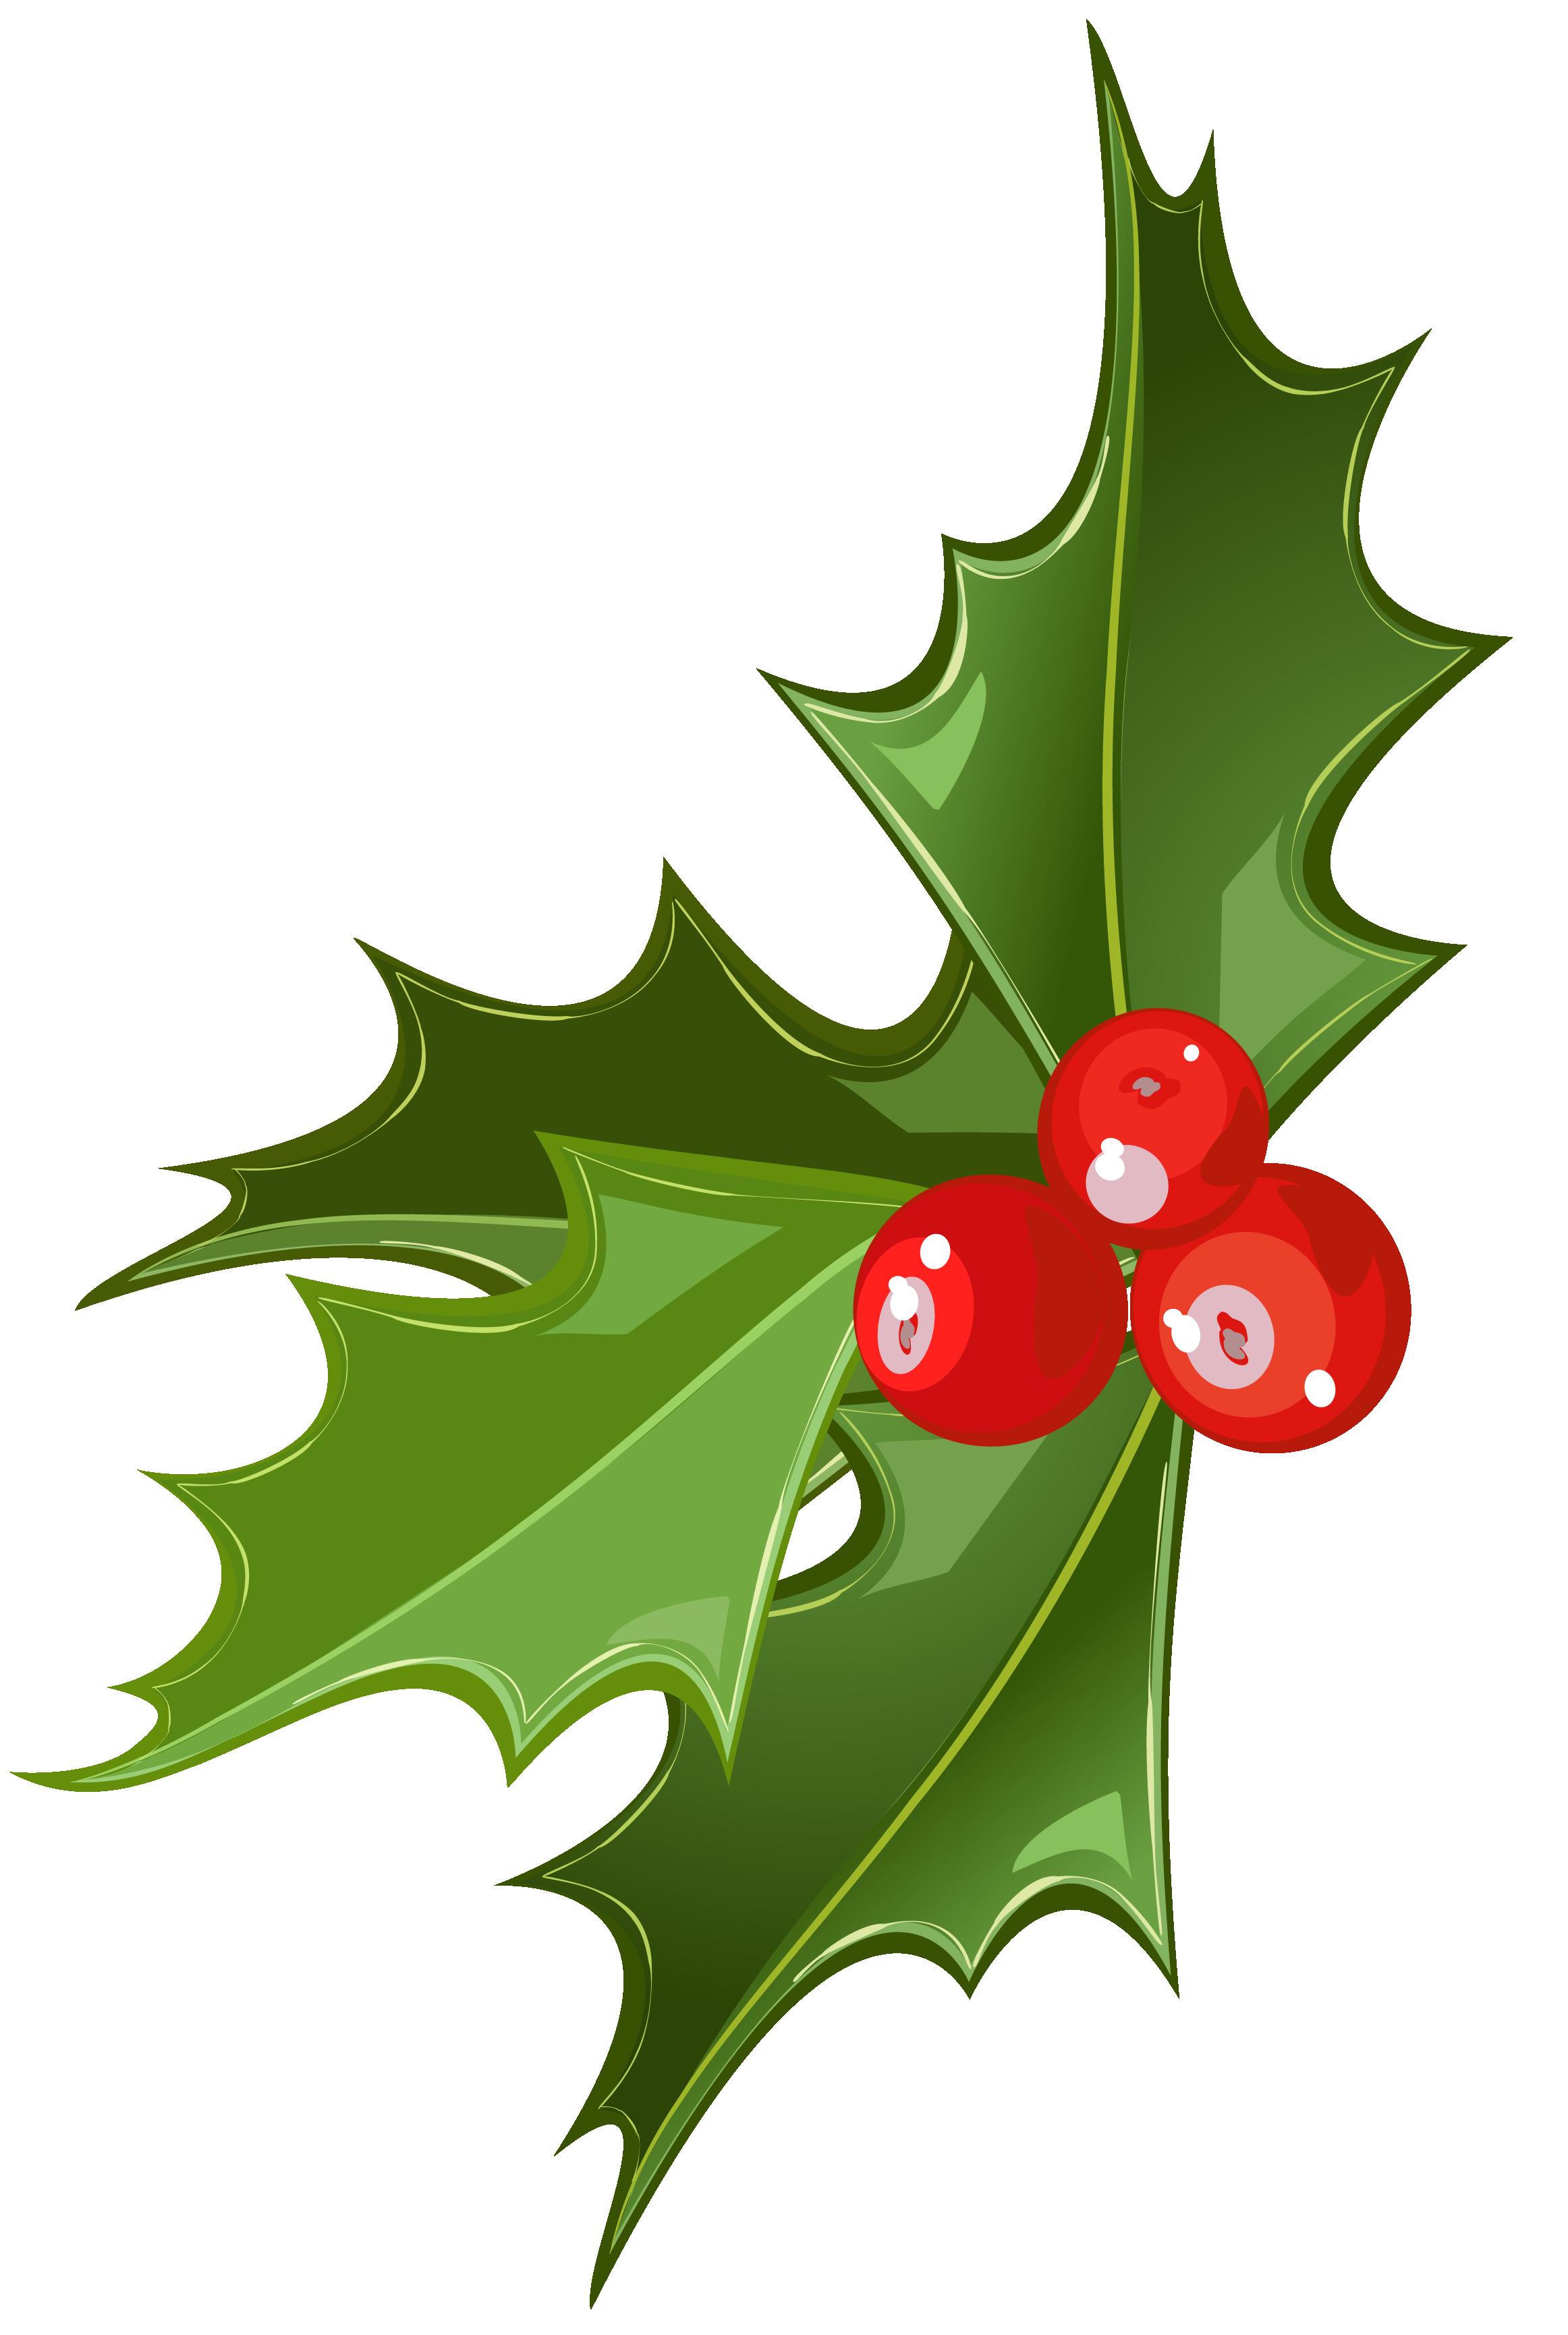 Christmas mistletoe clipart banner freeuse download Christmas Mistletoe Picture | Gallery Yopriceville - High-Quality ... banner freeuse download